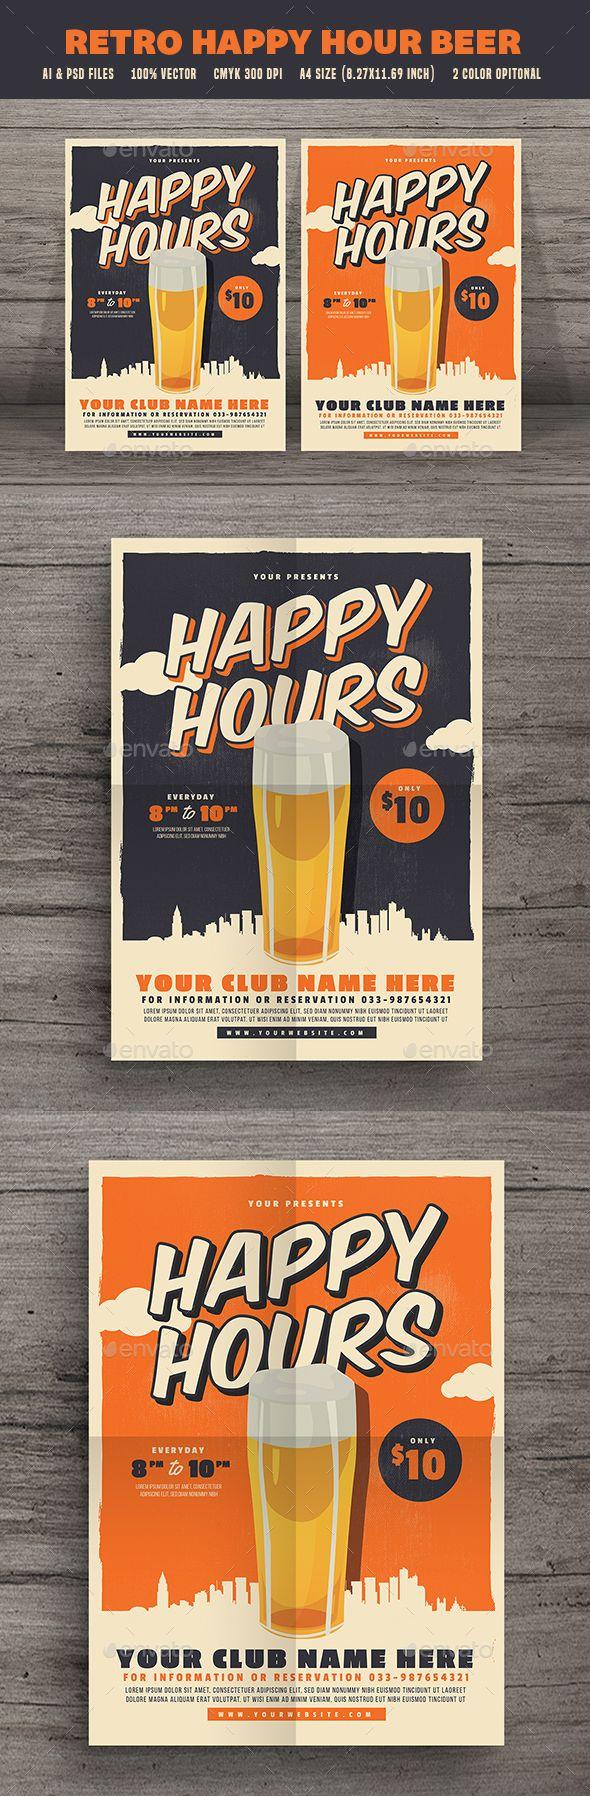 Retro Happy Hour Beer Festival — Photoshop PSD #bar • Download ➝ https://graphicriver.net/item/retro-happy-hour-beer-festival/19498315?ref=pxcr